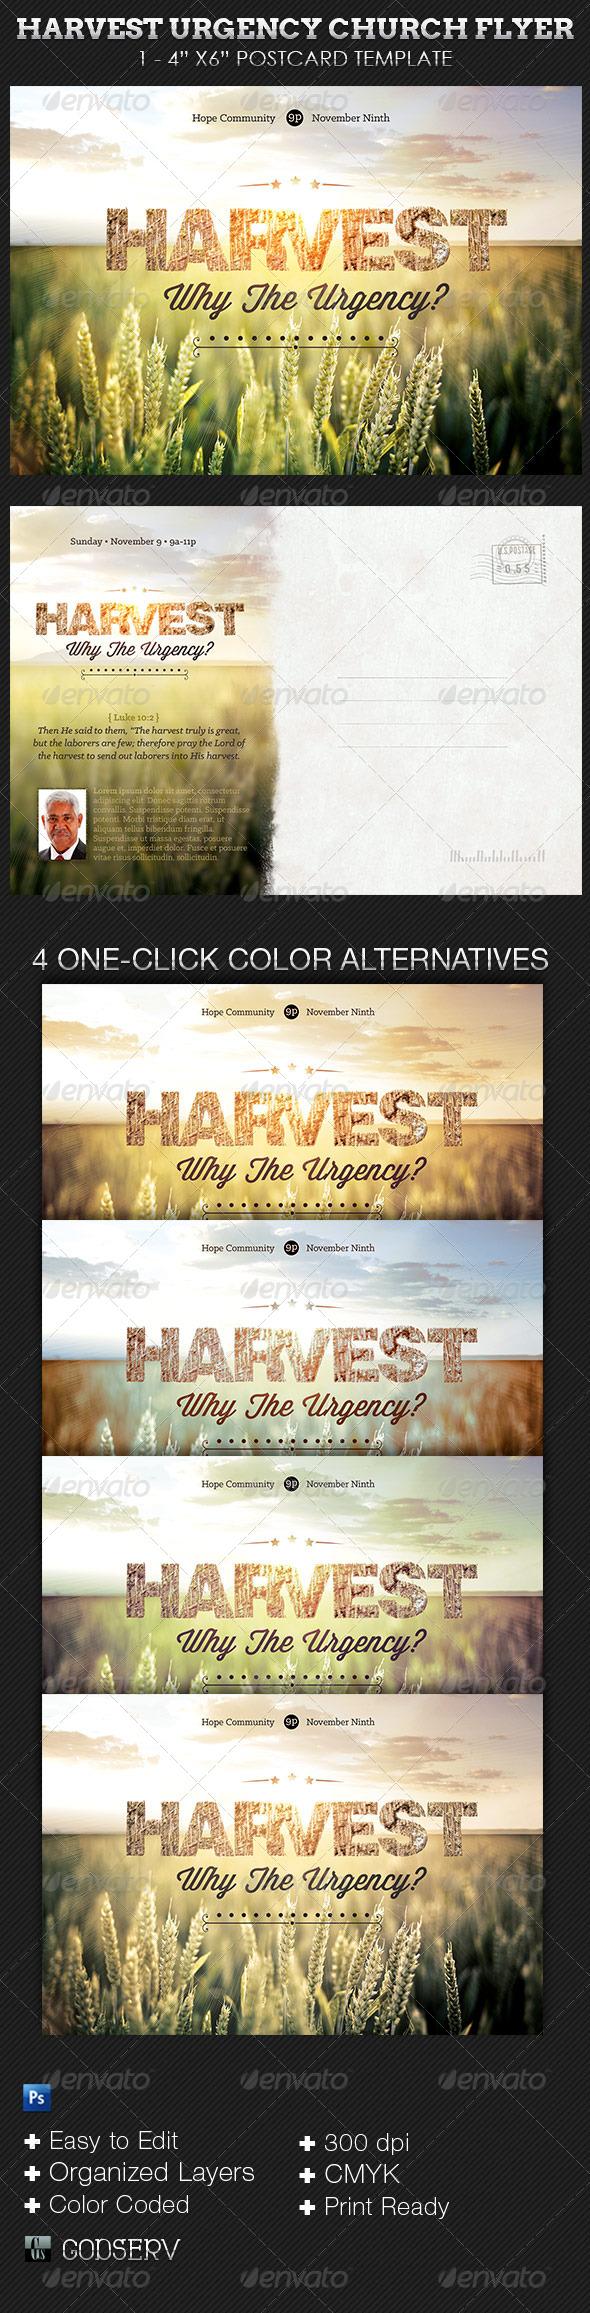 Harvest Urgency Church Flyer and Postcard Template - Church Flyers